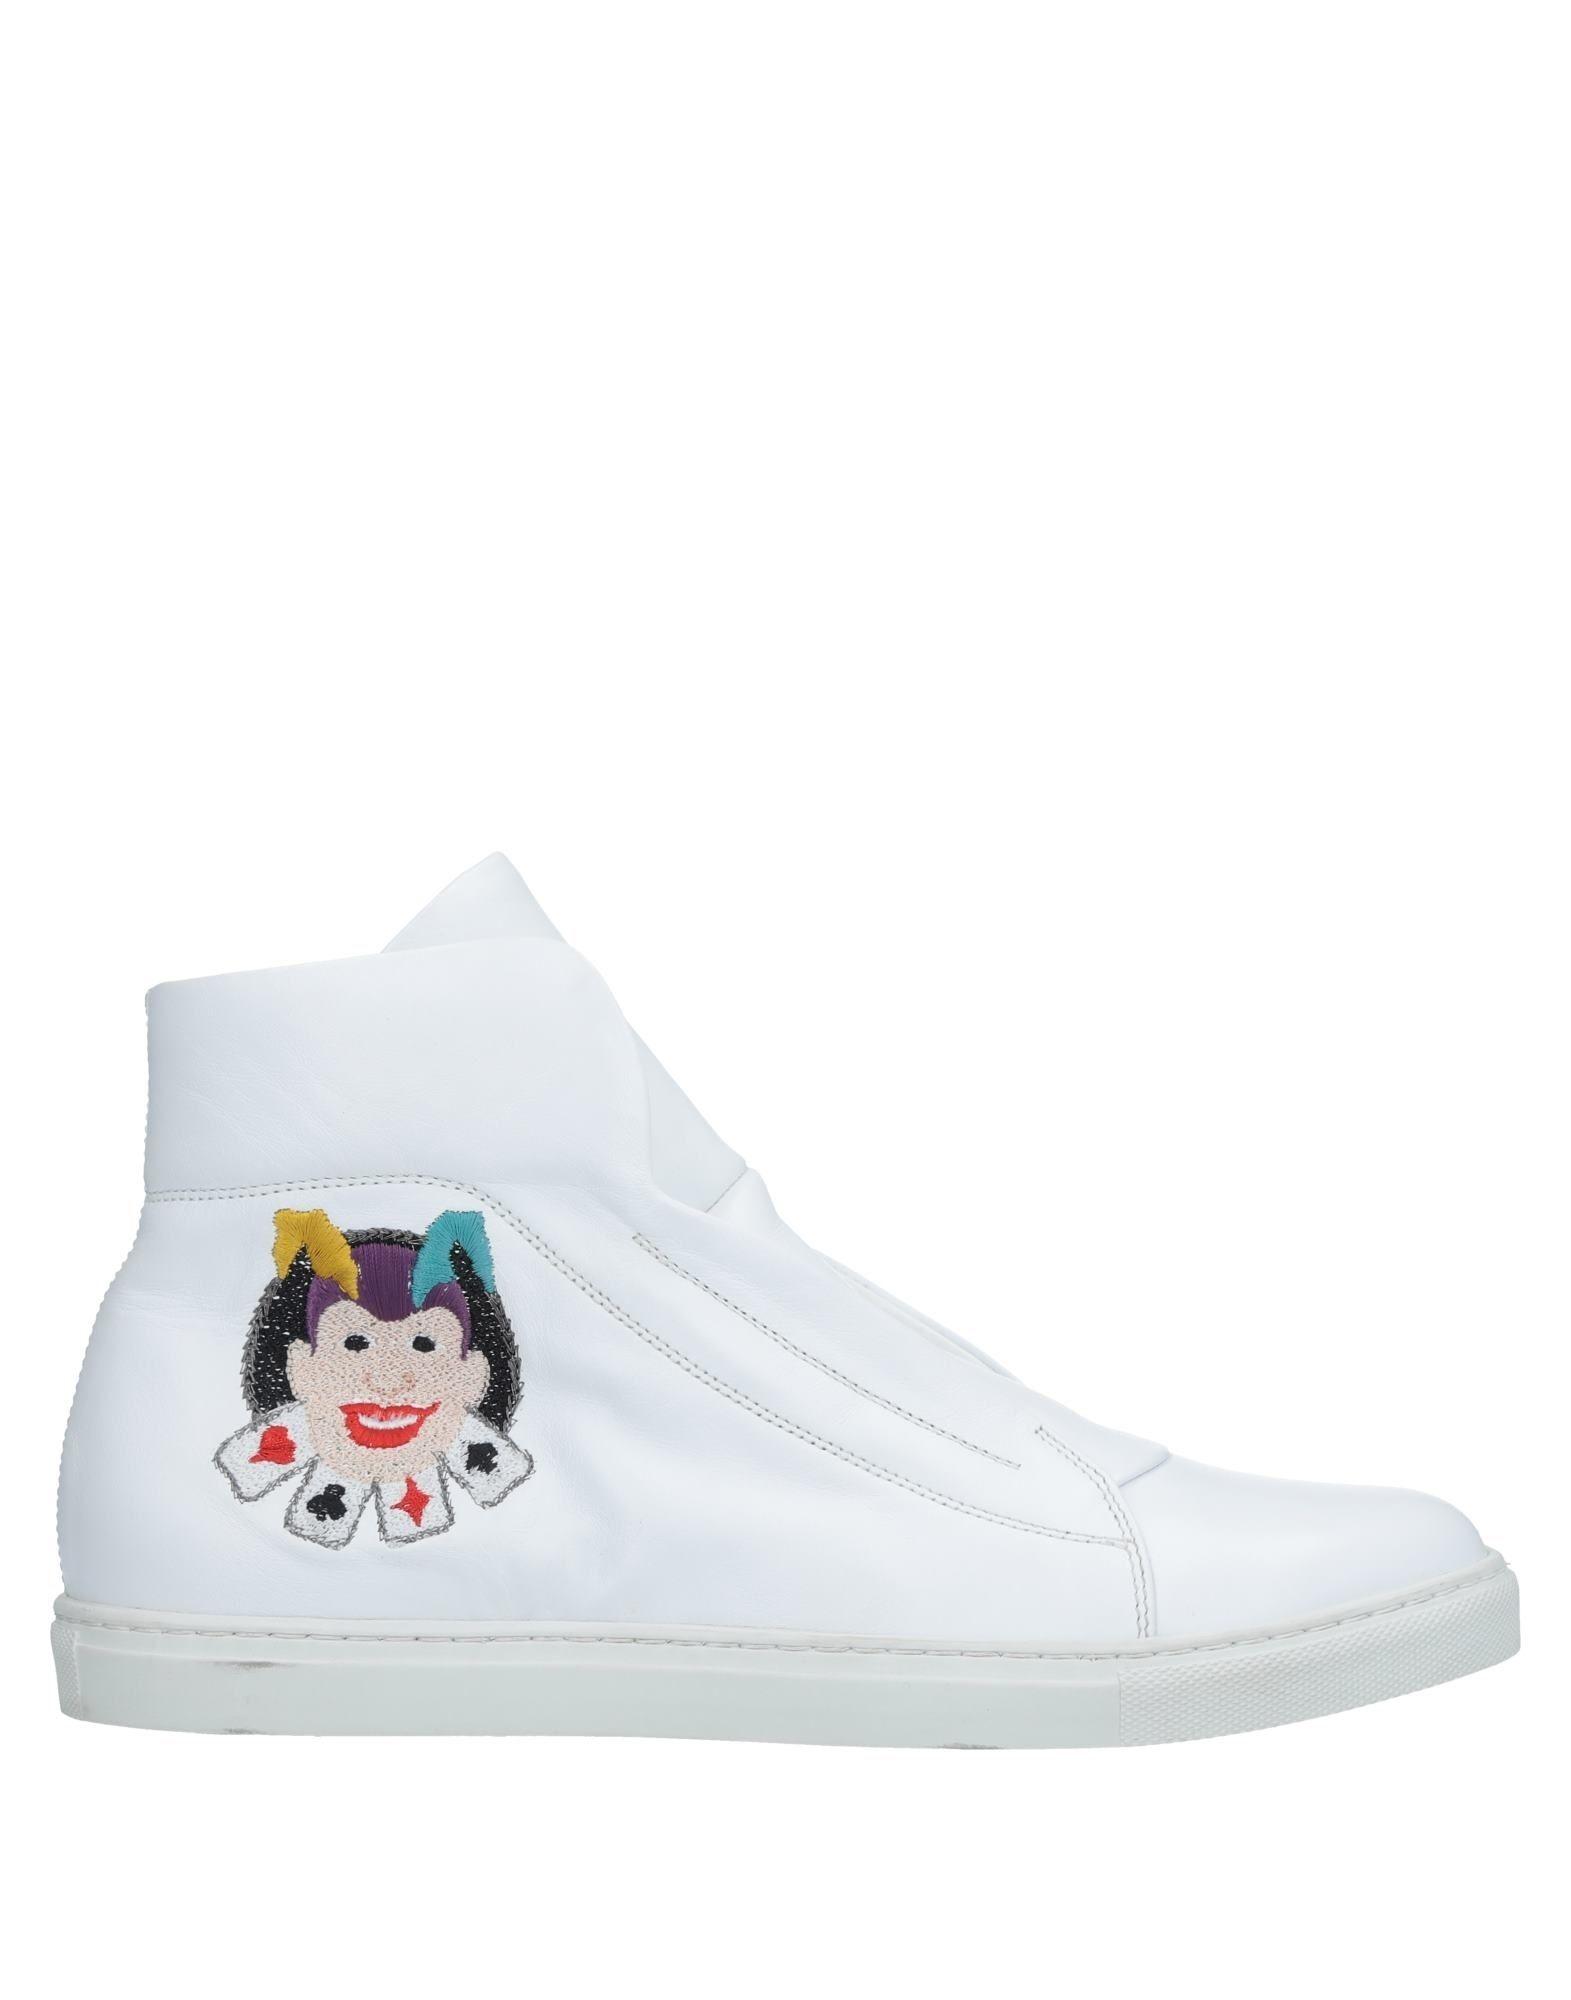 Alberto Moretti Sneakers Damen  11533555BPGut aussehende strapazierfähige Schuhe